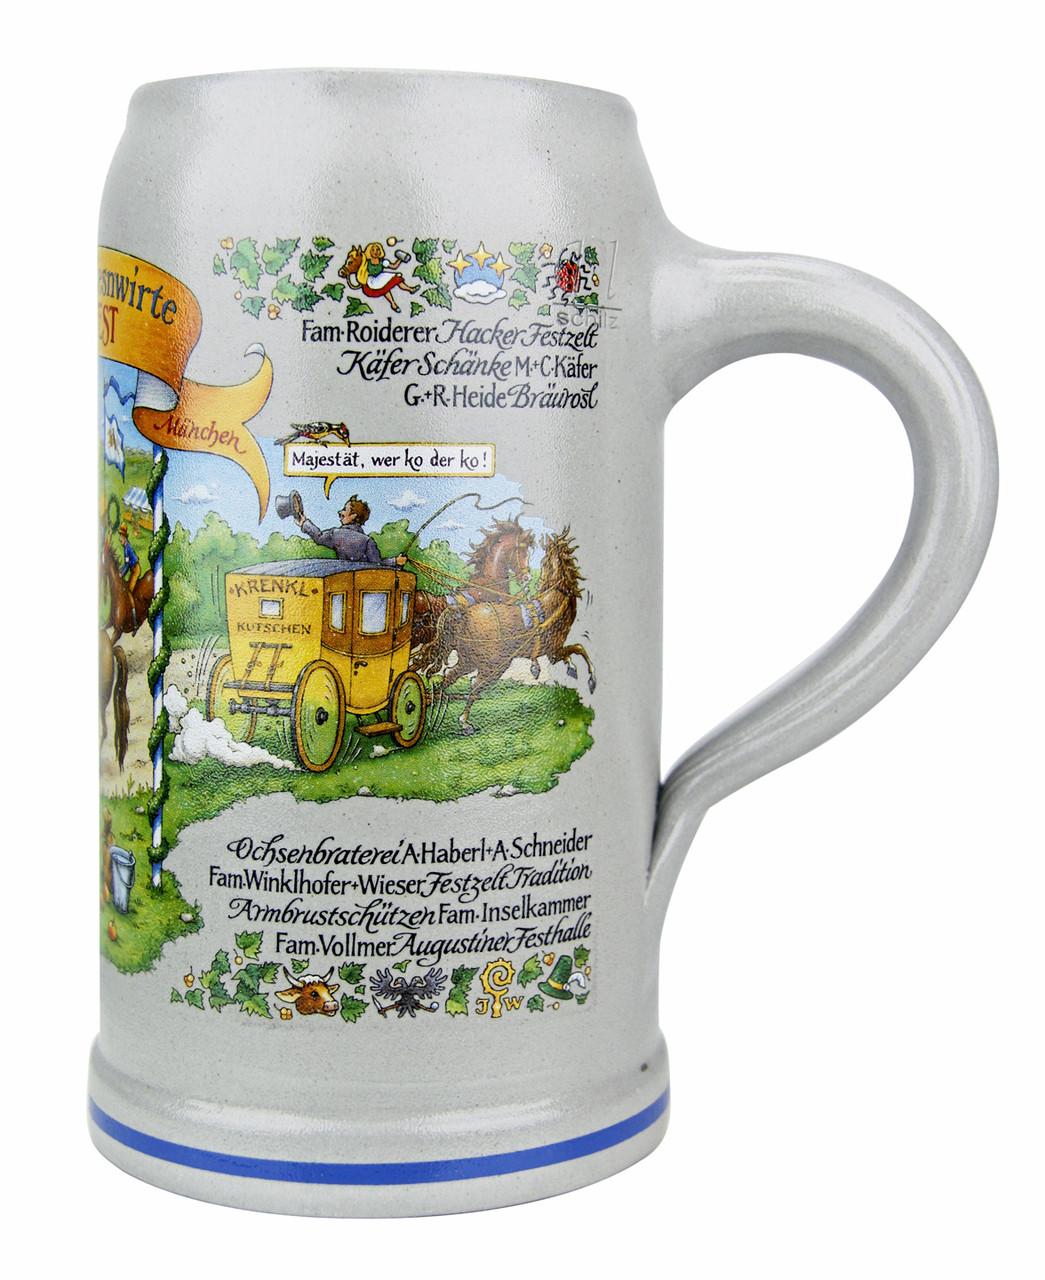 Official Munich Oktoberfest 2015 Wirtekrug Salt Glaze Beer Mug